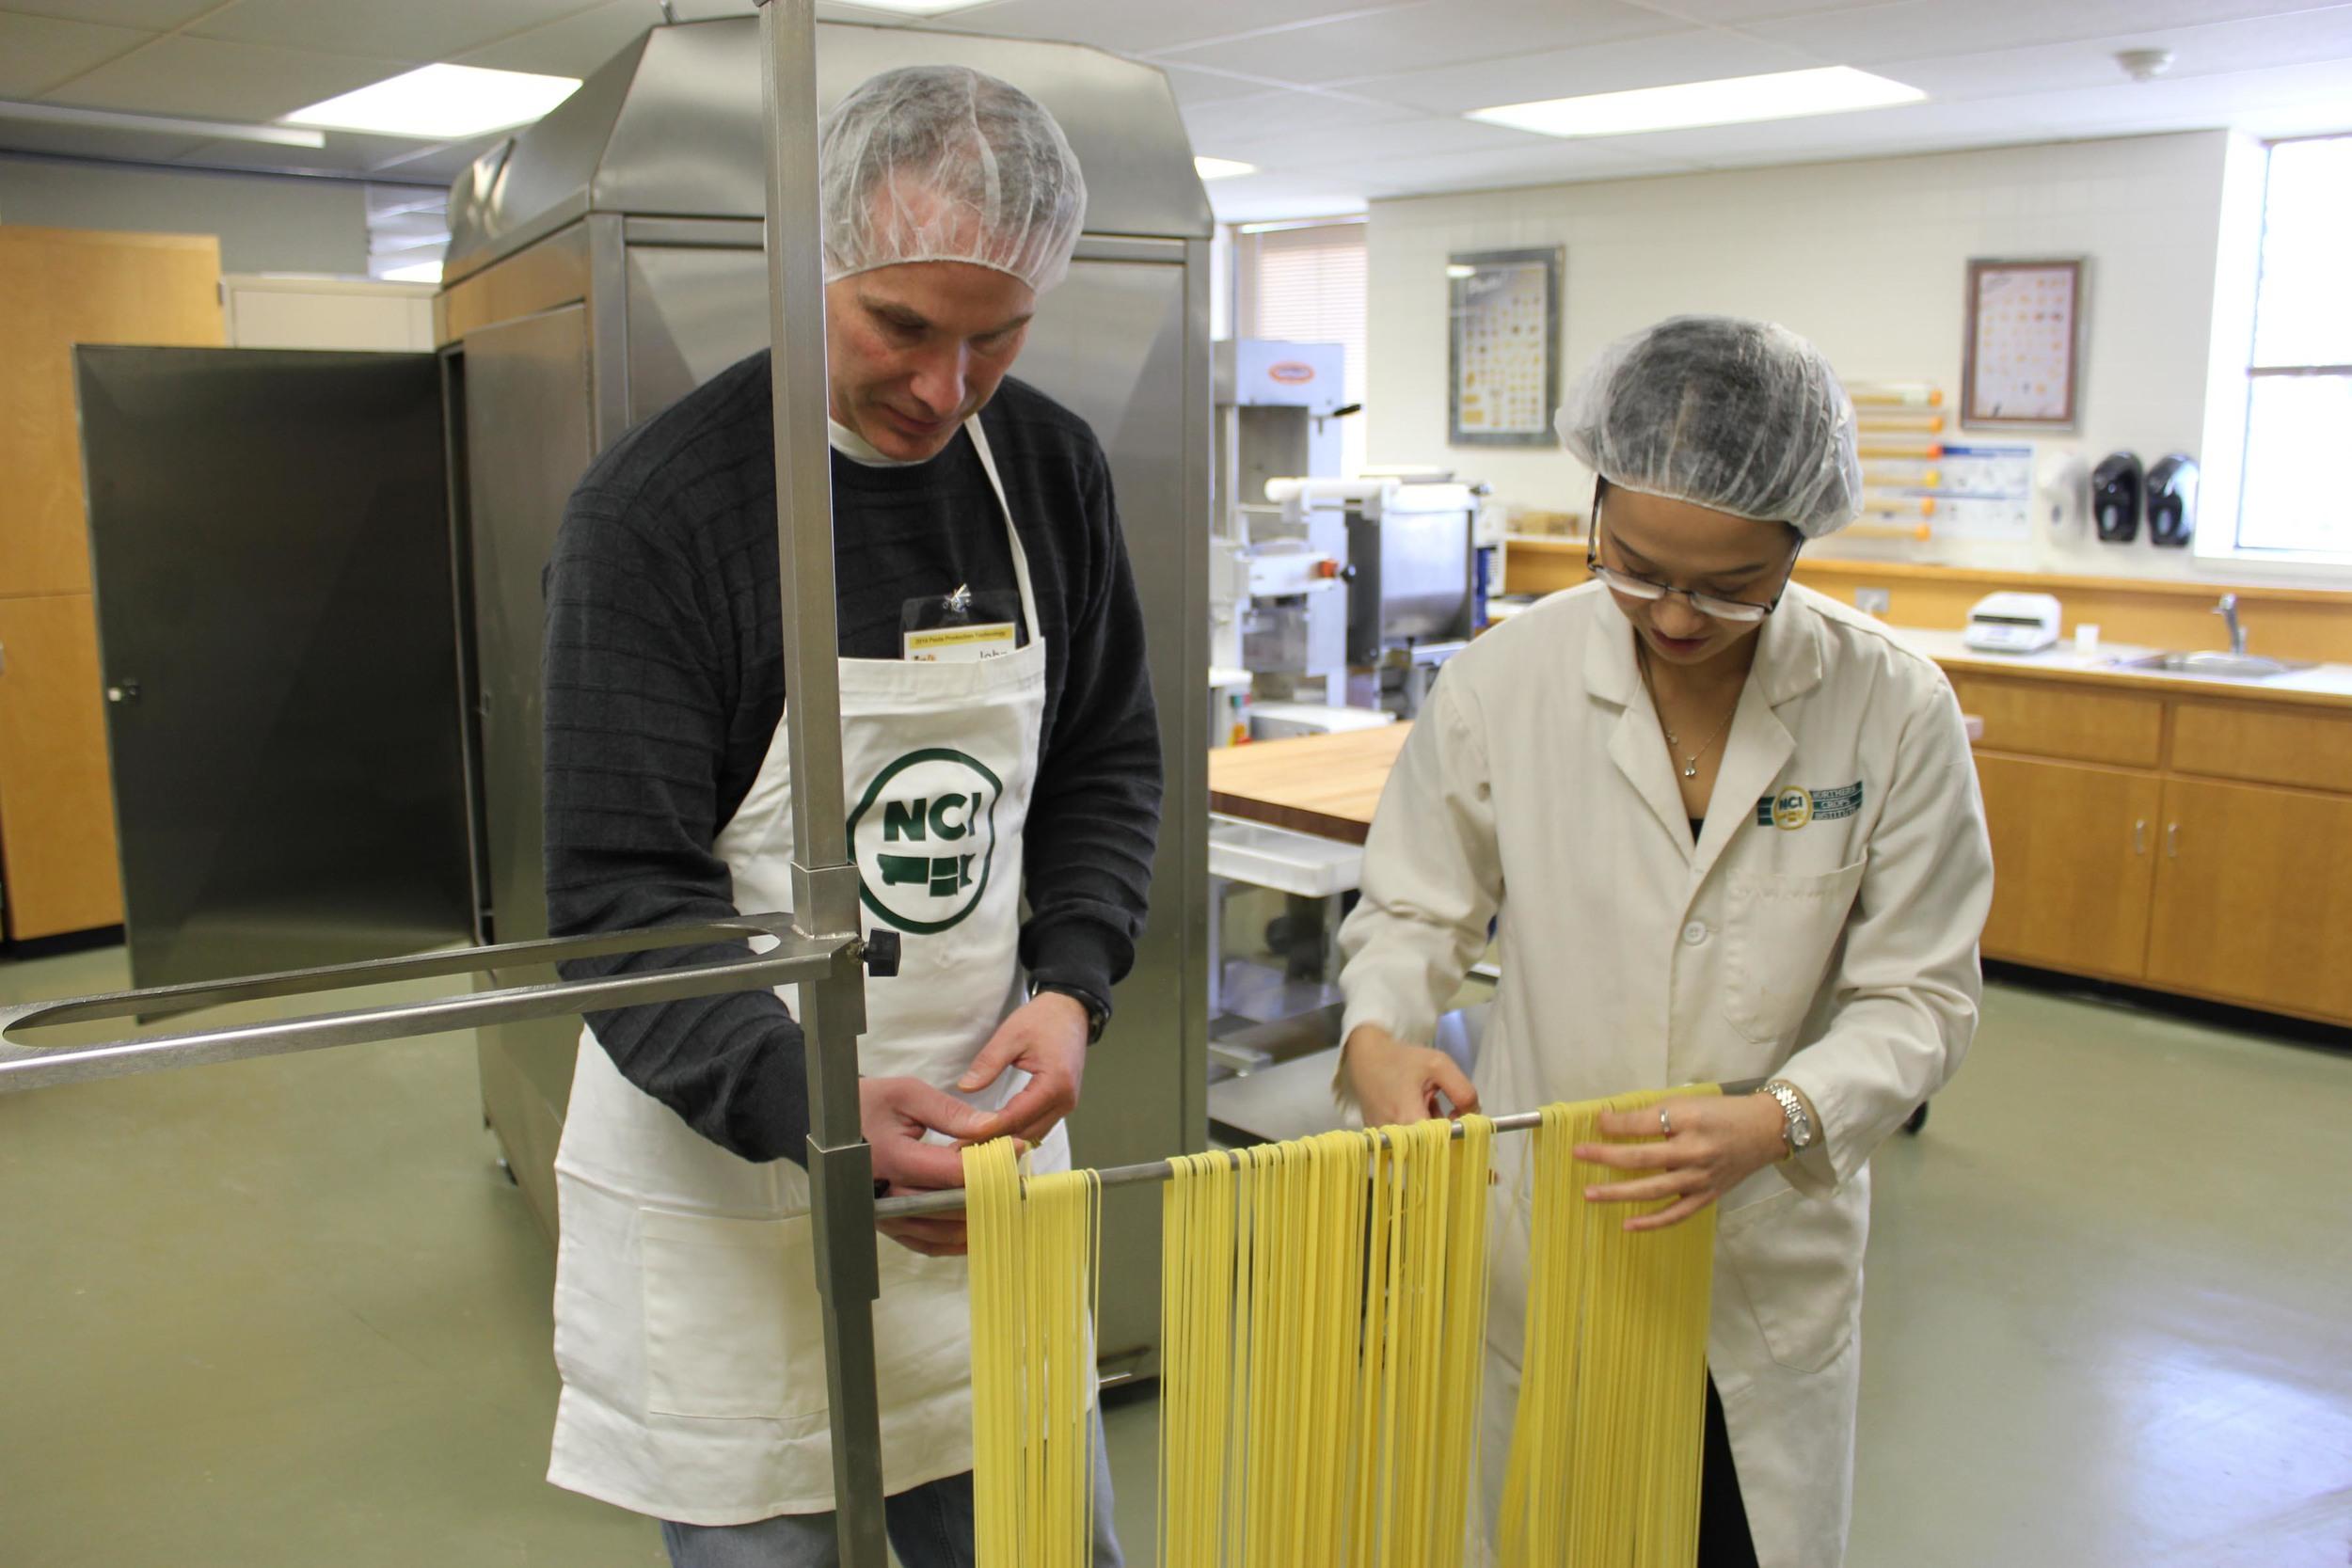 2014 Pasta Production Course 6362.JPG